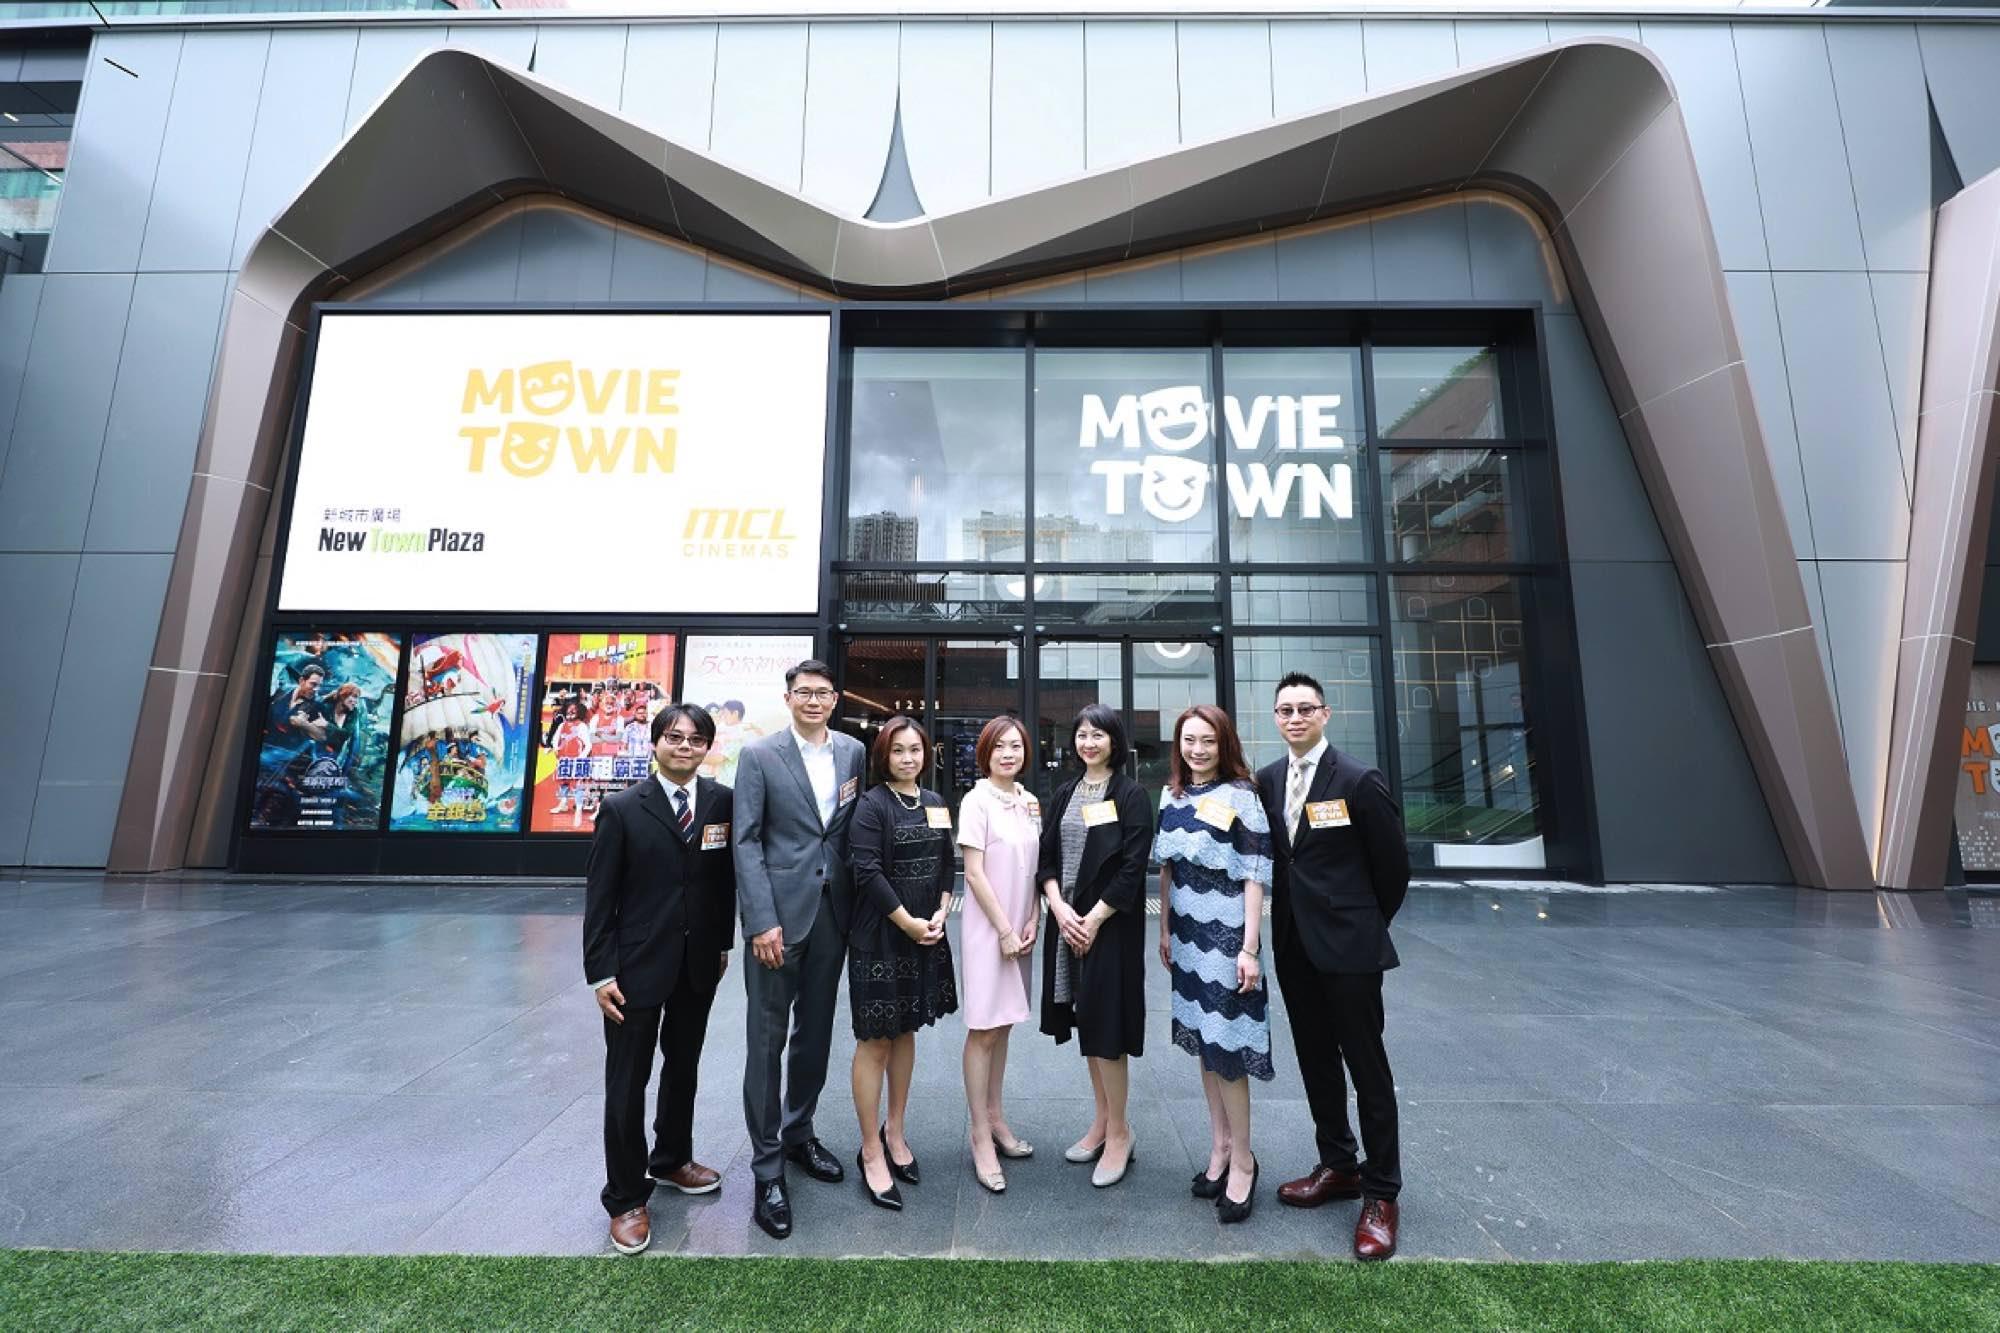 MCL MOVIE TOWN 引入 Samsung Onyx Cinema LED 屏幕  開著燈睇細緻畫質又 buy 唔 buy?